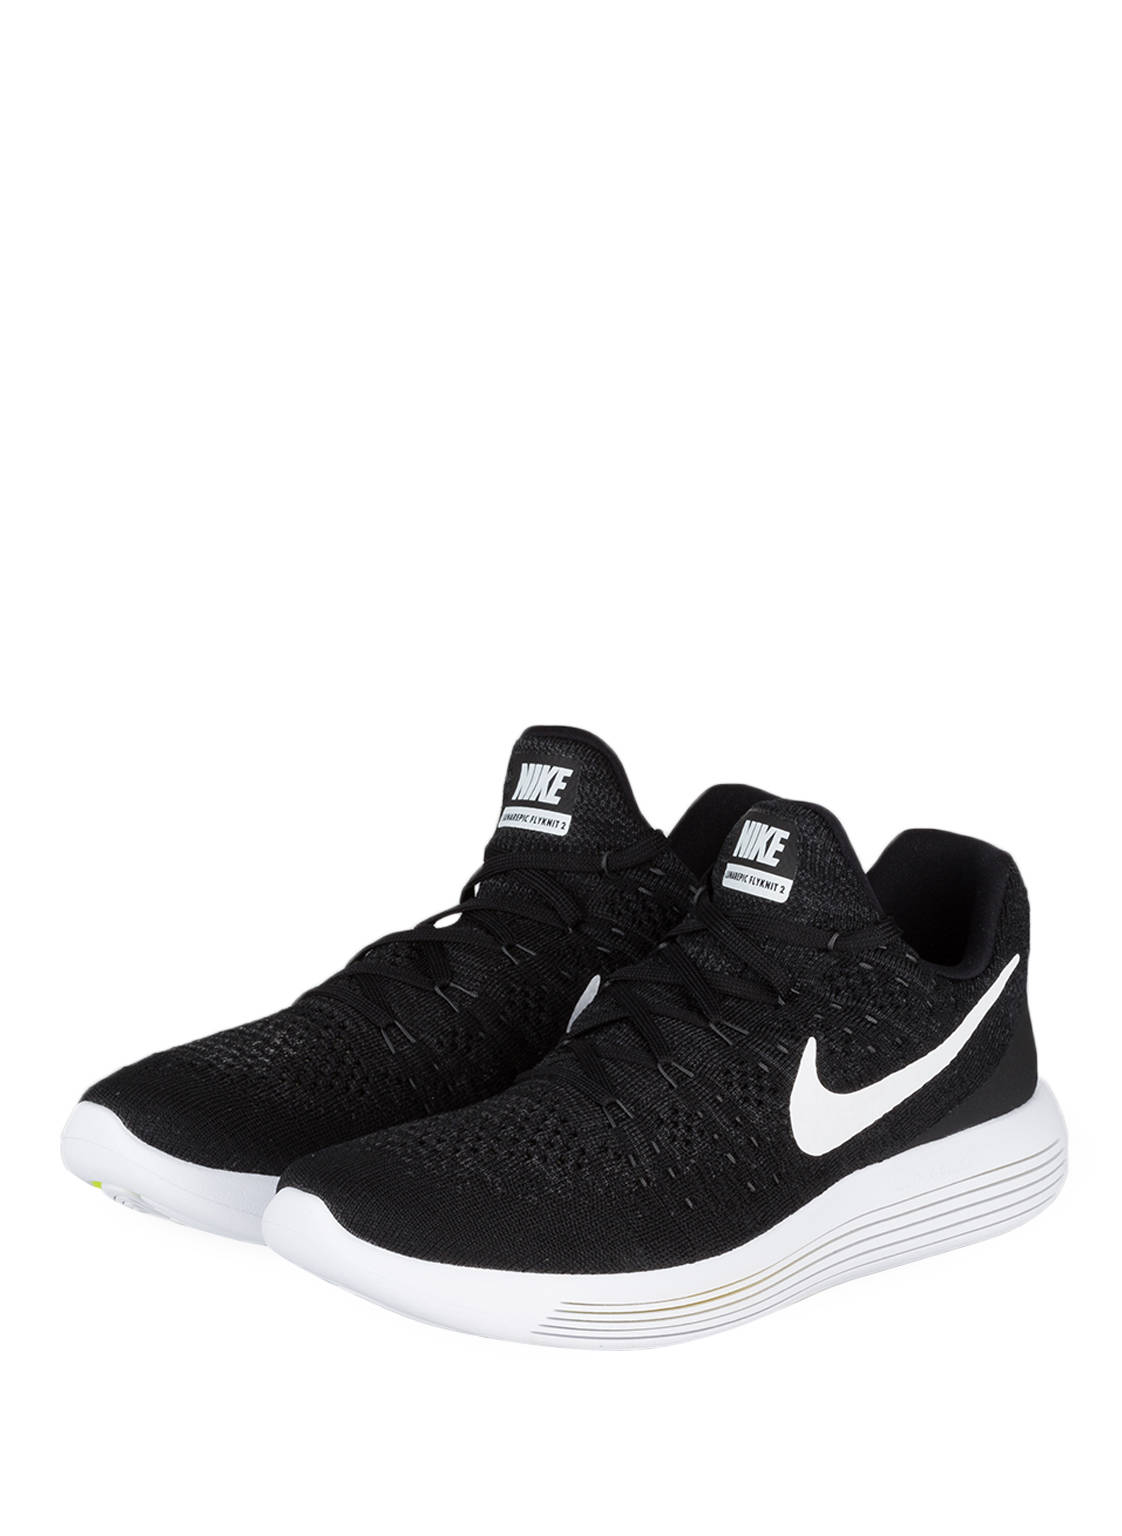 Nike Laufschuhe LUNAR EPIC LOW FLYKNIT 2